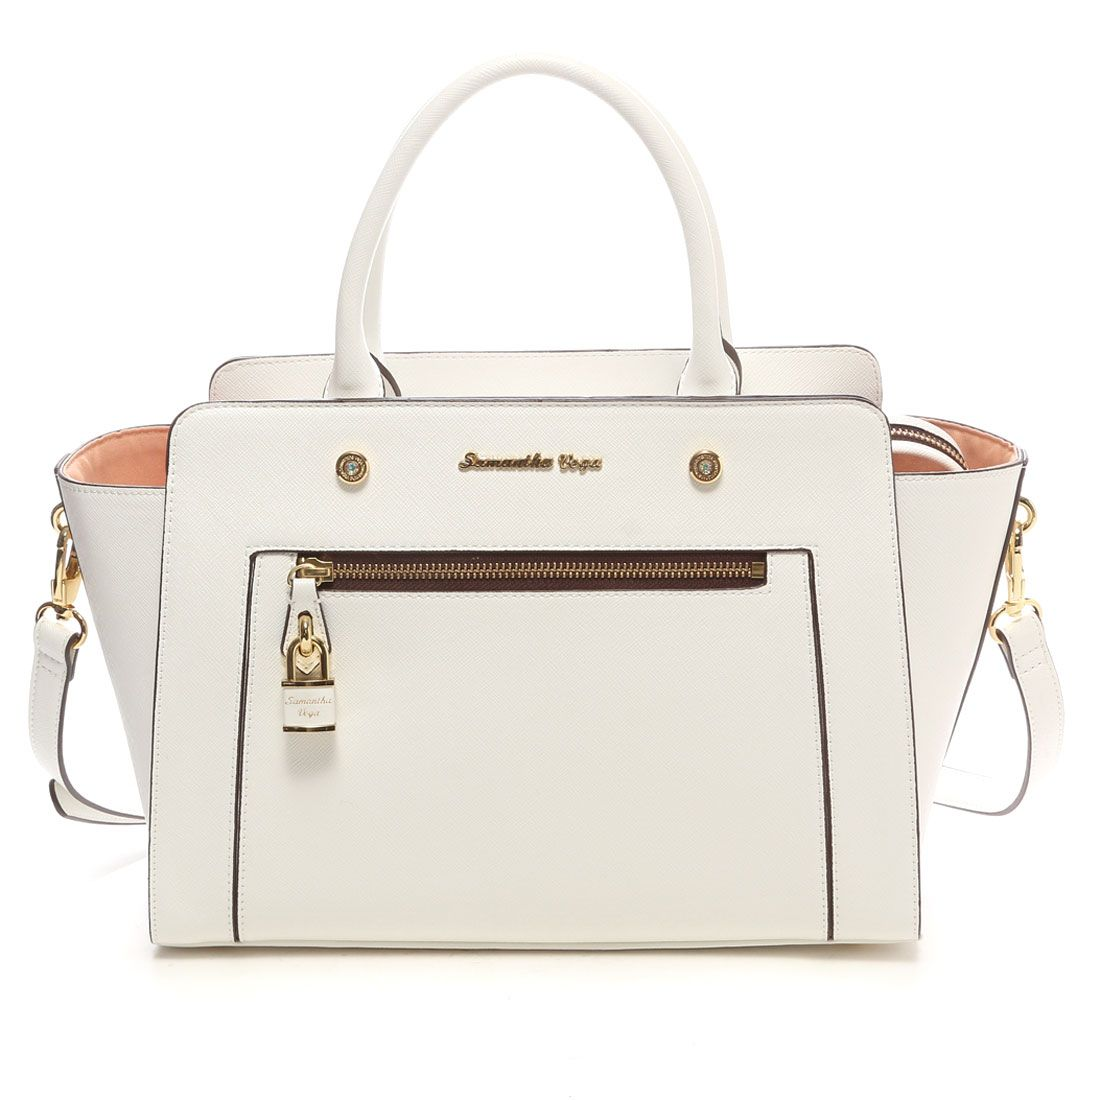 e822527f6d99 Samantha Thavasa サマンサベガ フロントジップトートバッグ 大(ホワイト) -靴とファッションの通販サイト ロコンド